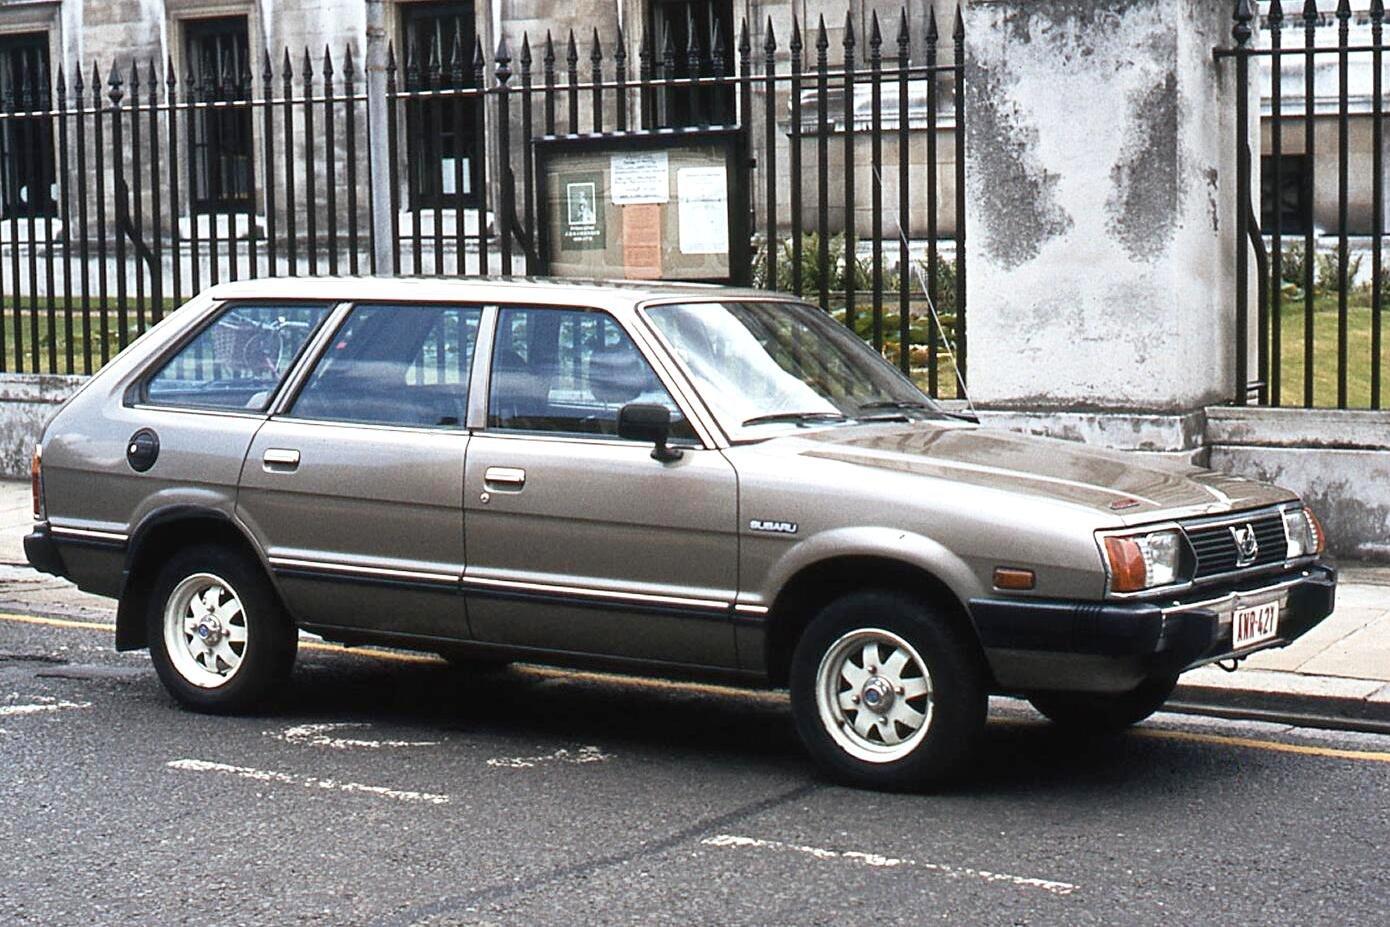 File:Subaru Kombi Fitzwilliam.jpg - Wikimedia Commons